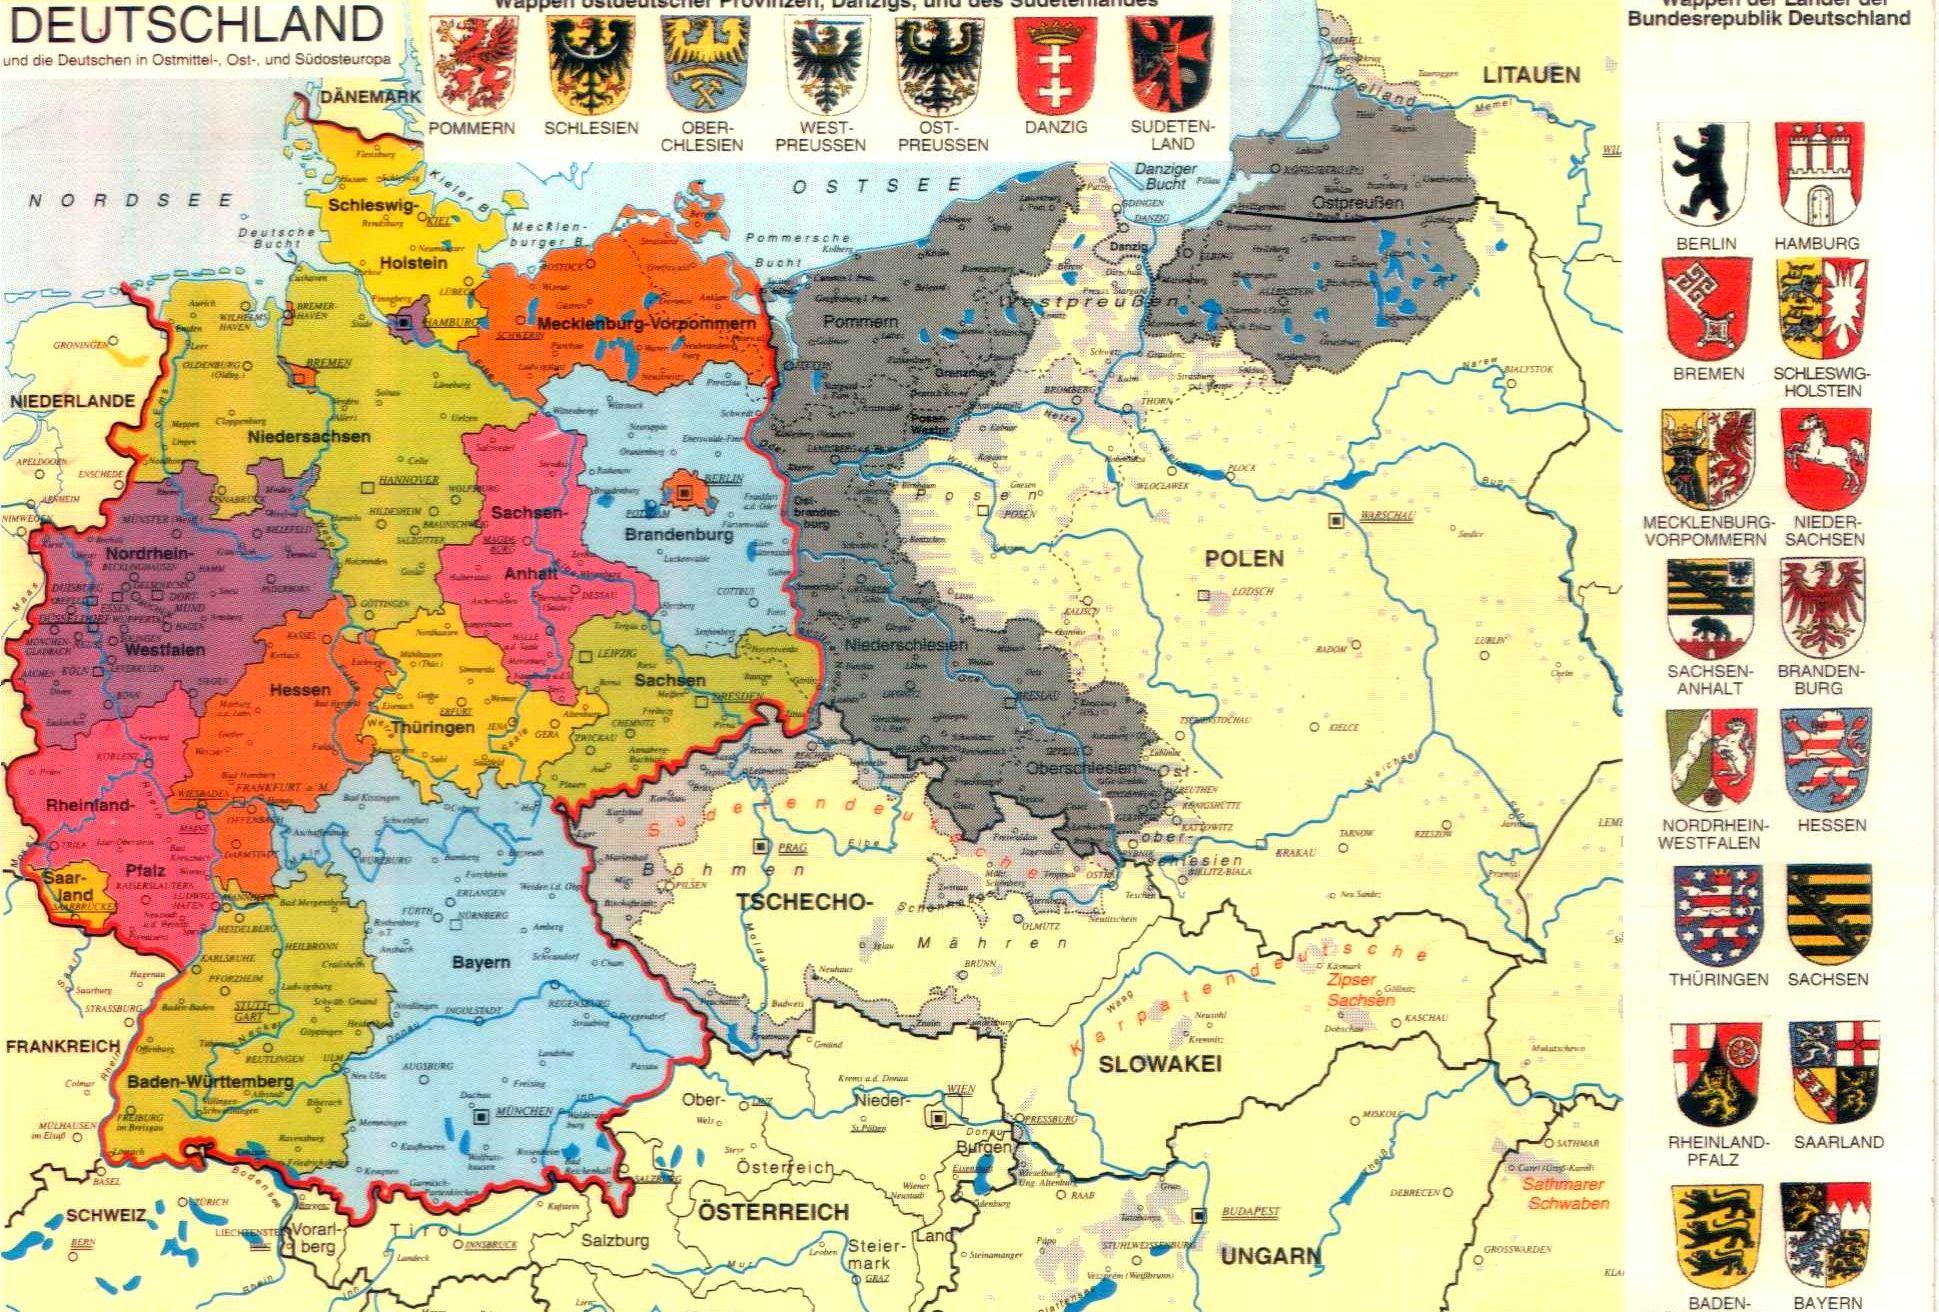 alte deutschland karte Alte Deutschland Karte | jooptimmer alte deutschland karte